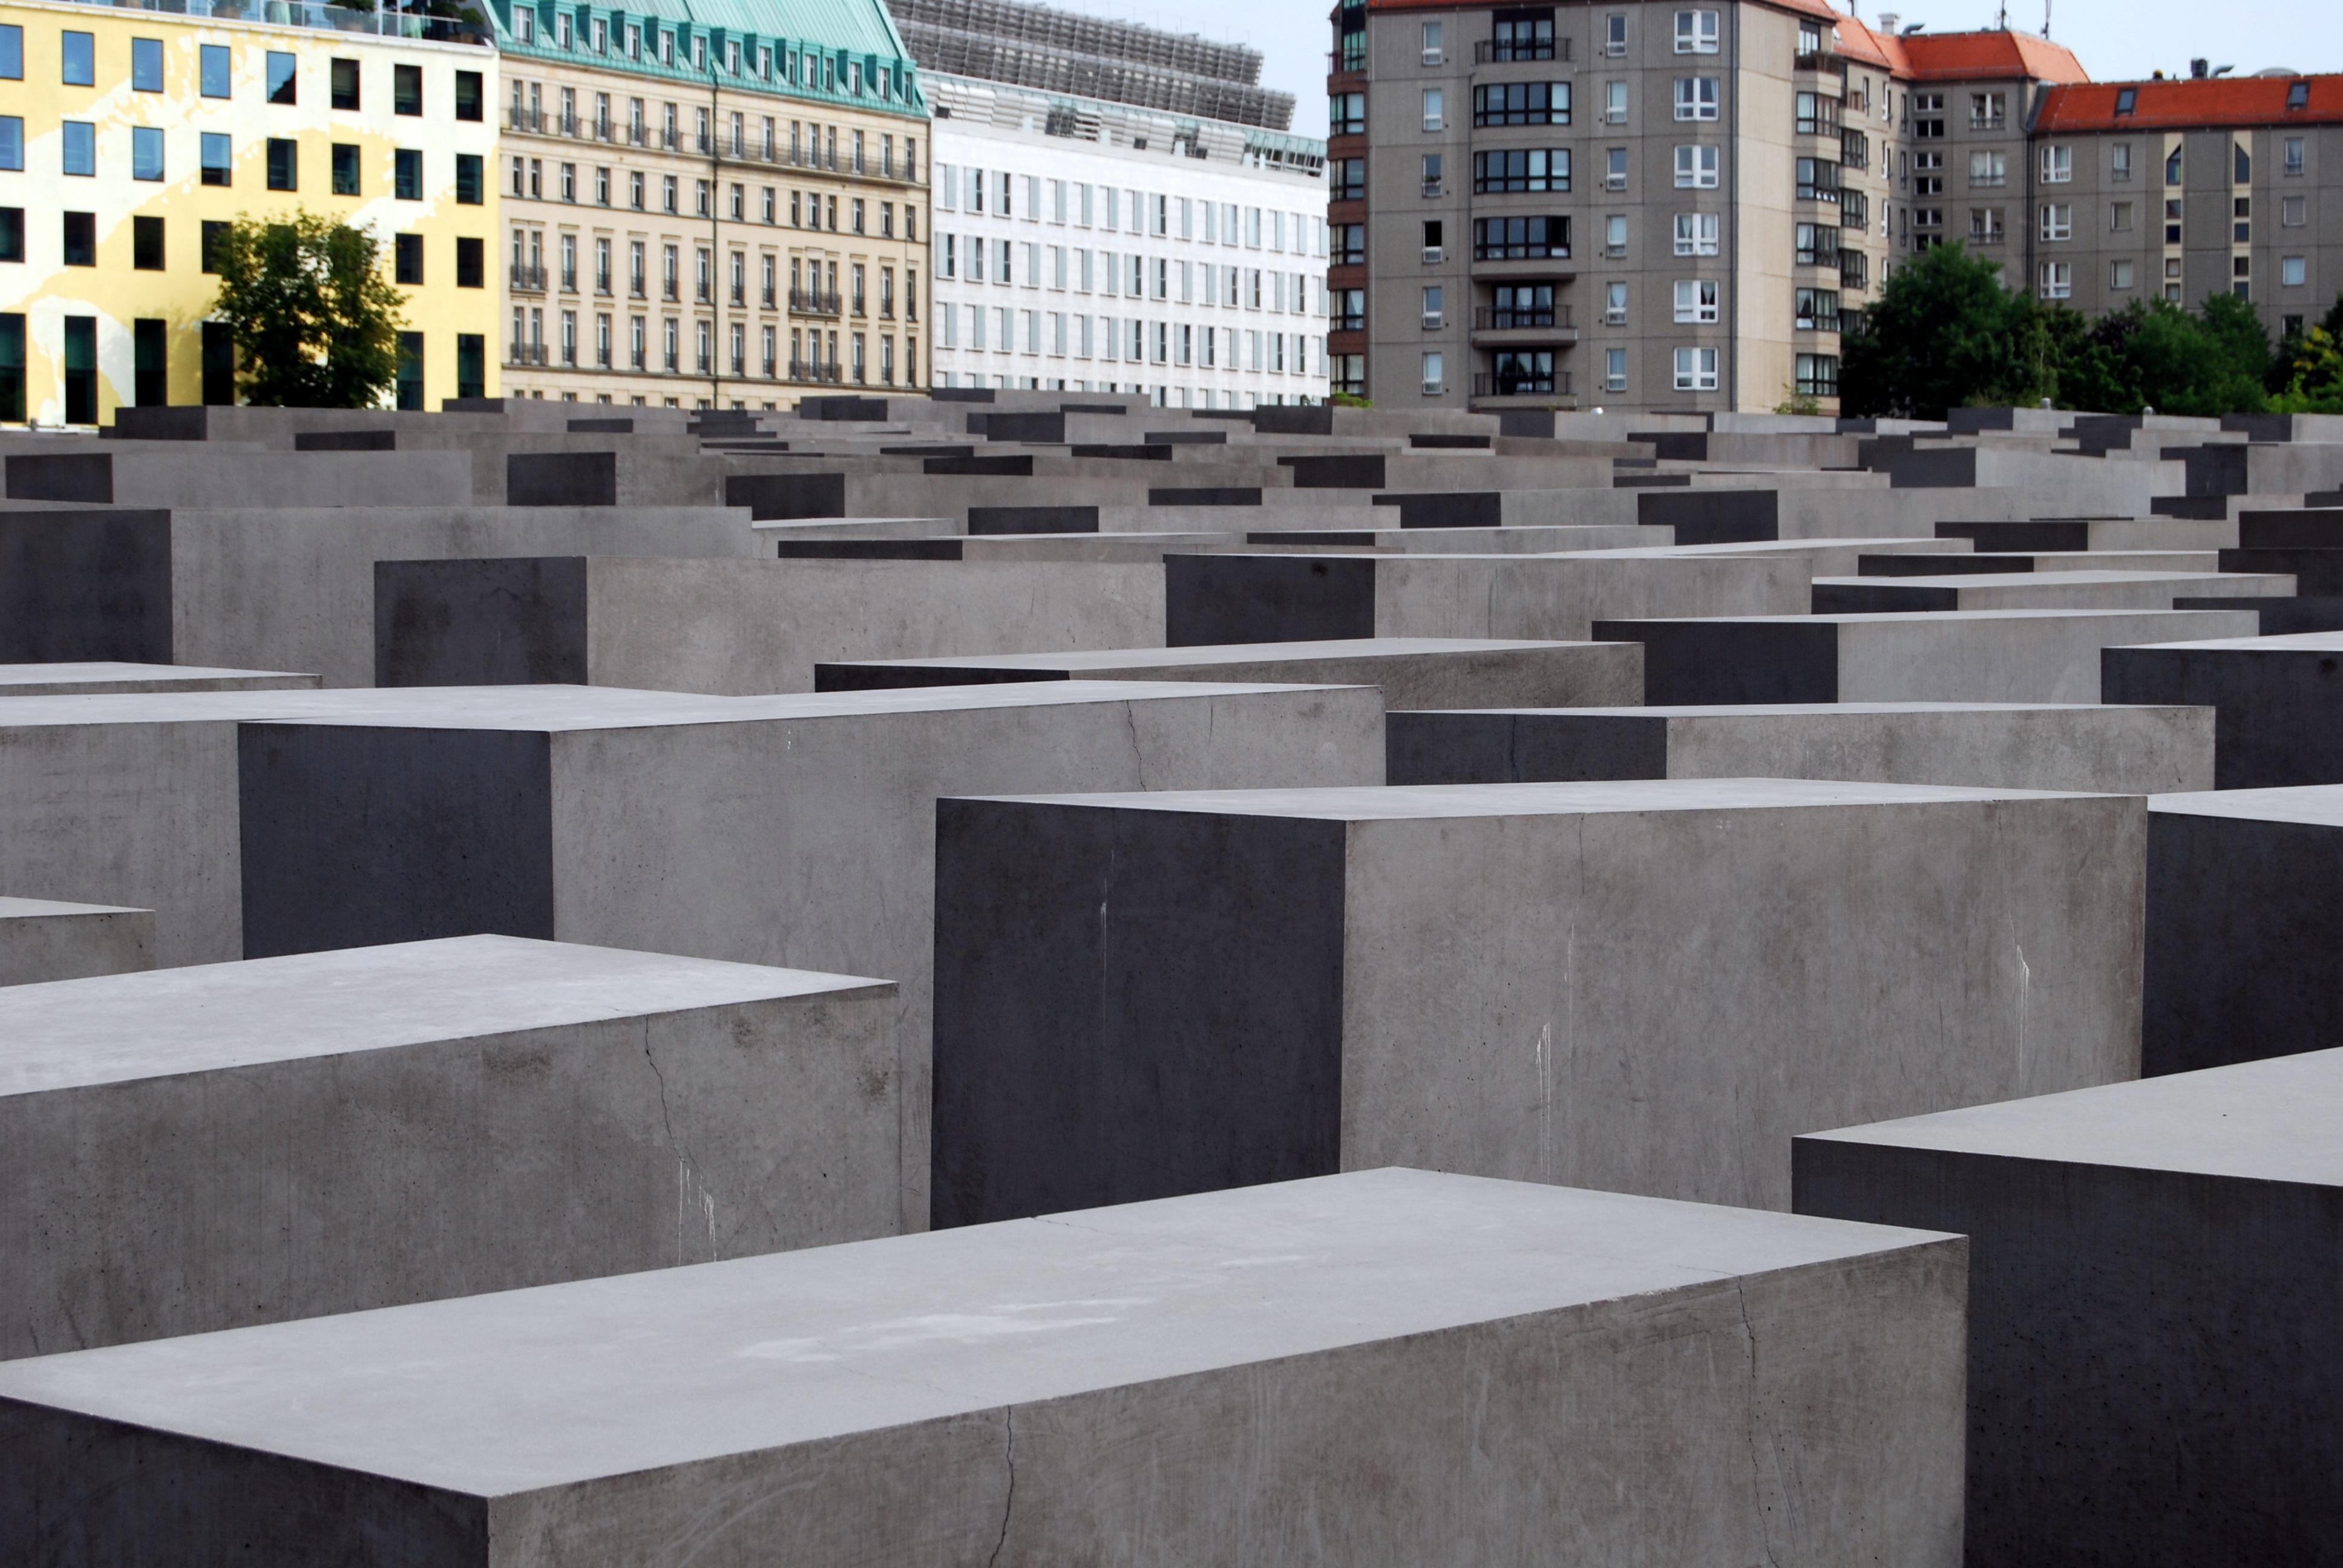 Fotos Gratis Arquitectura Pared Monumento Plaza Cementerio  # Muebles En Hebreo